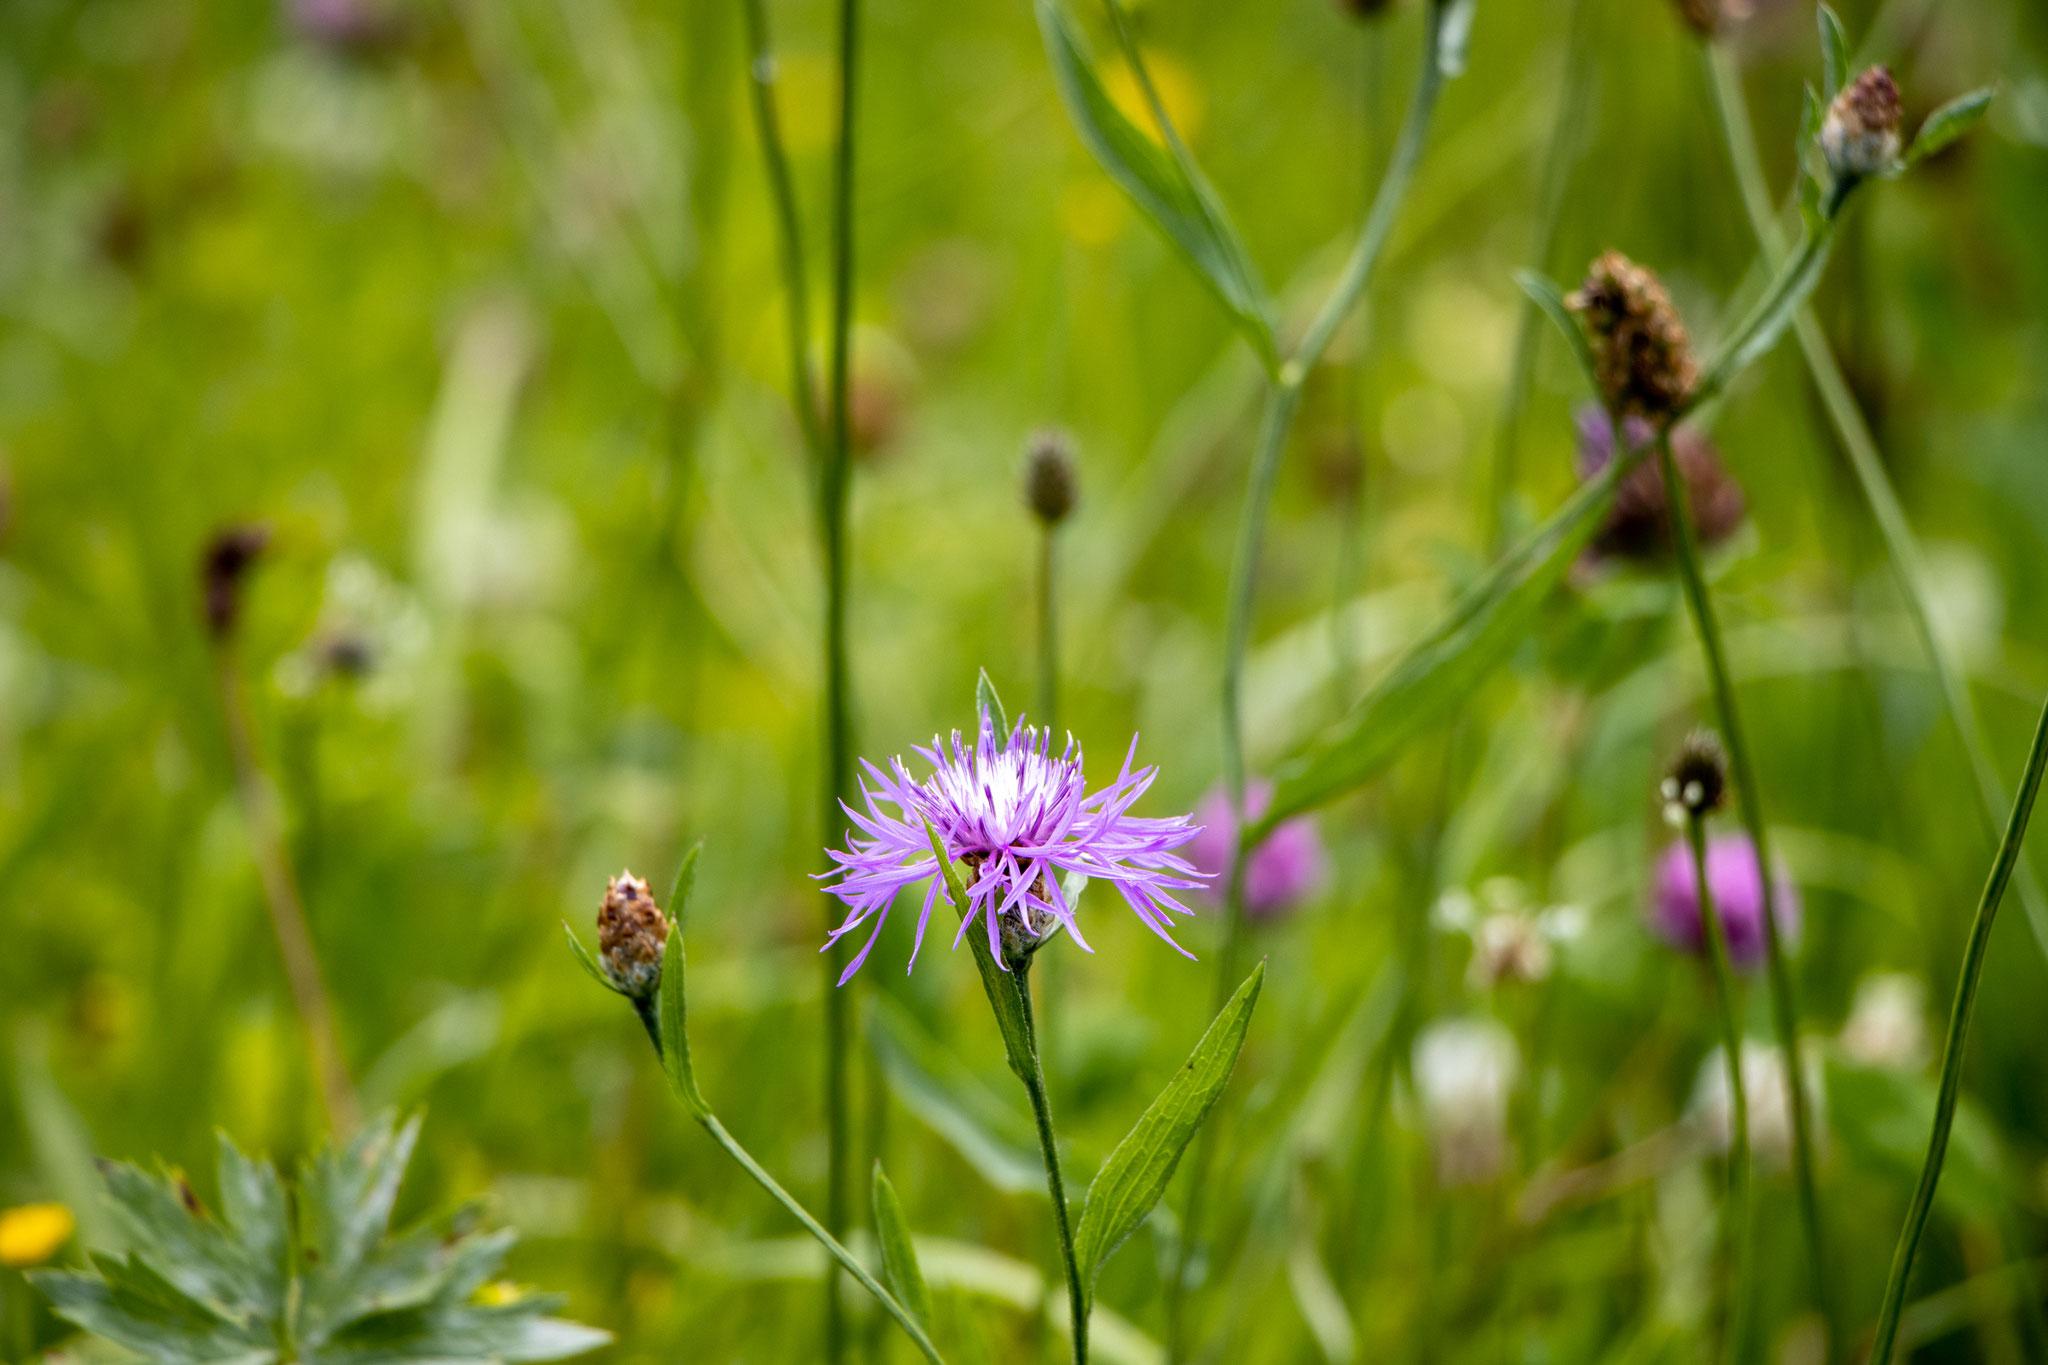 Wiesen-Flockenblume (Centaurea jacea) (BB)